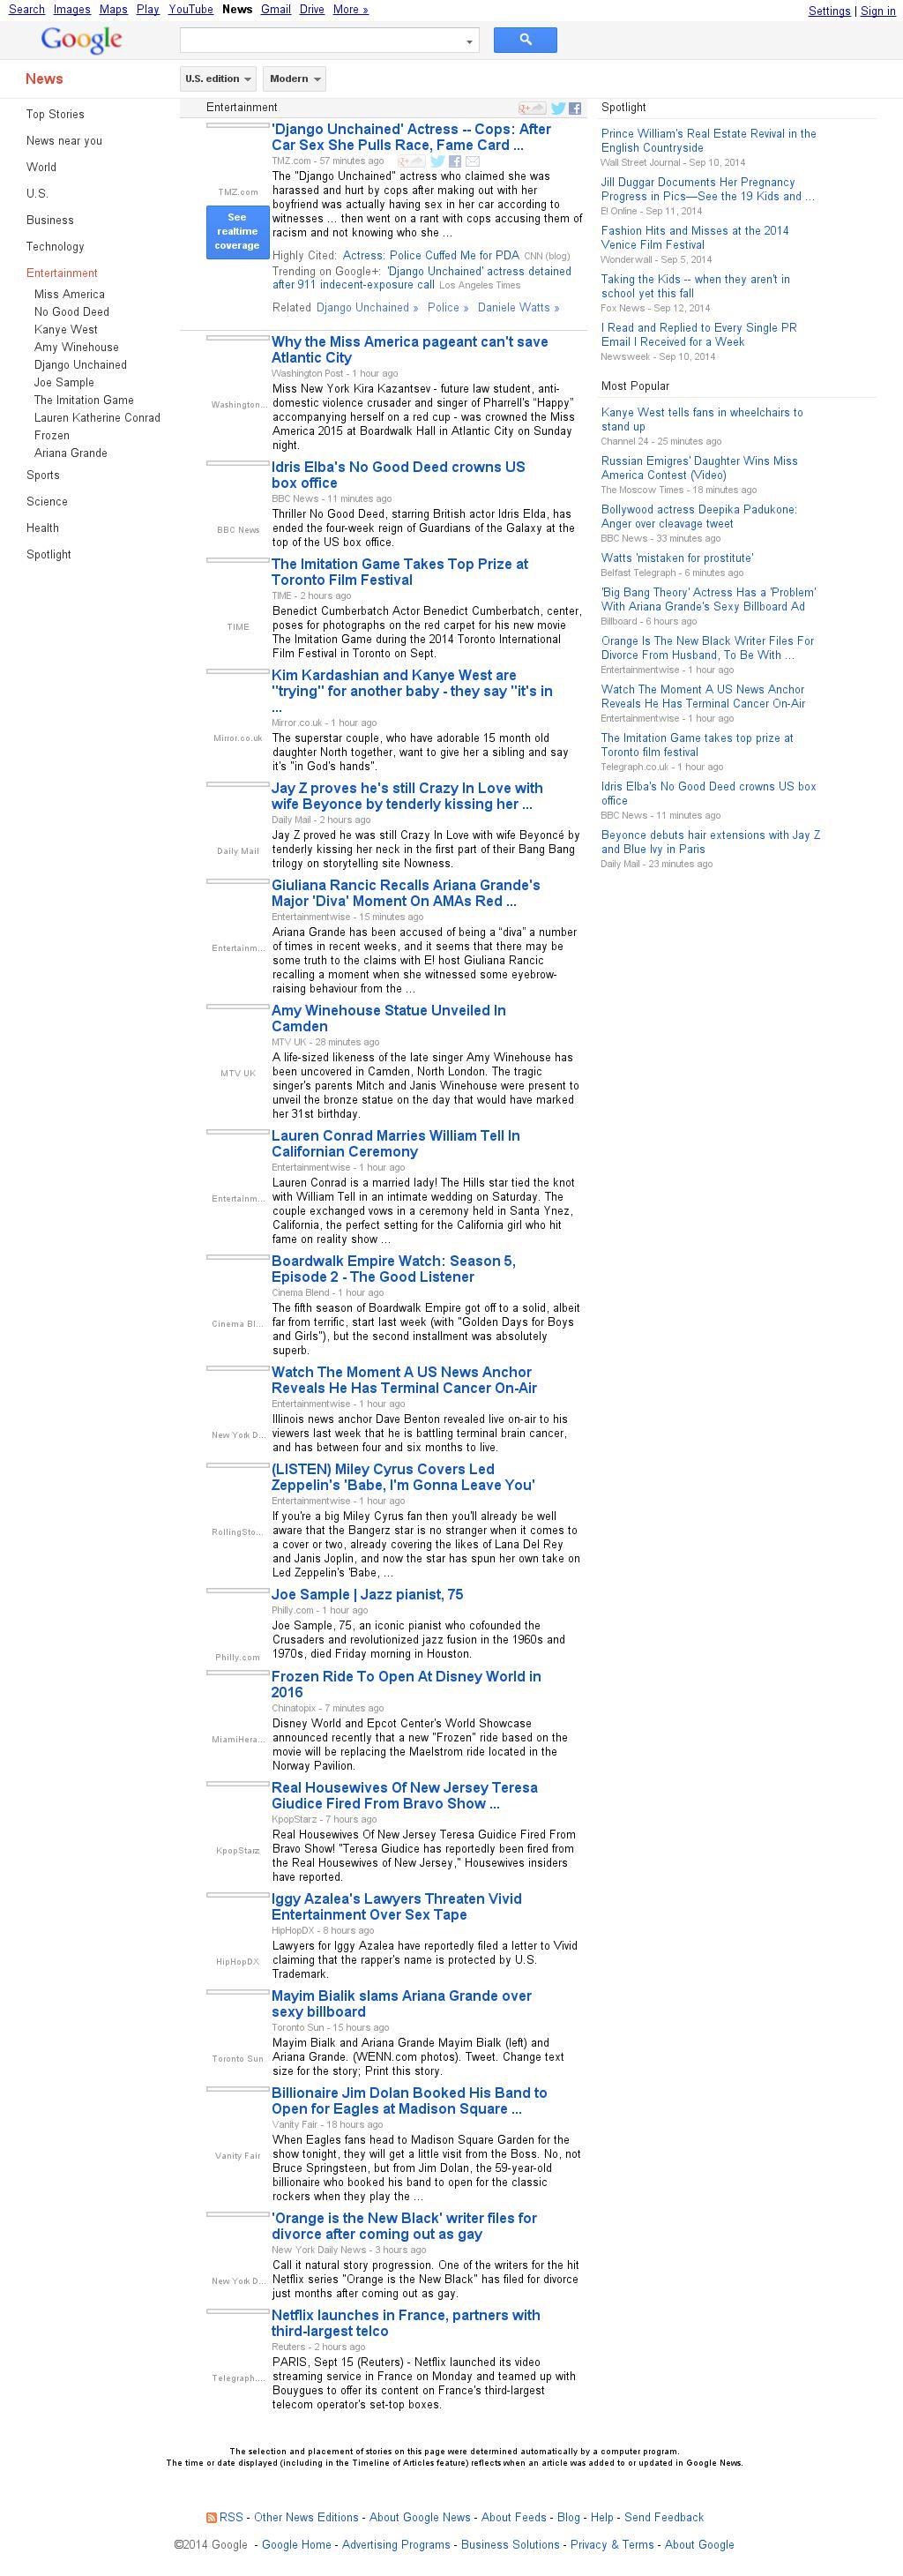 Google News: Entertainment at Monday Sept. 15, 2014, 9:07 a.m. UTC